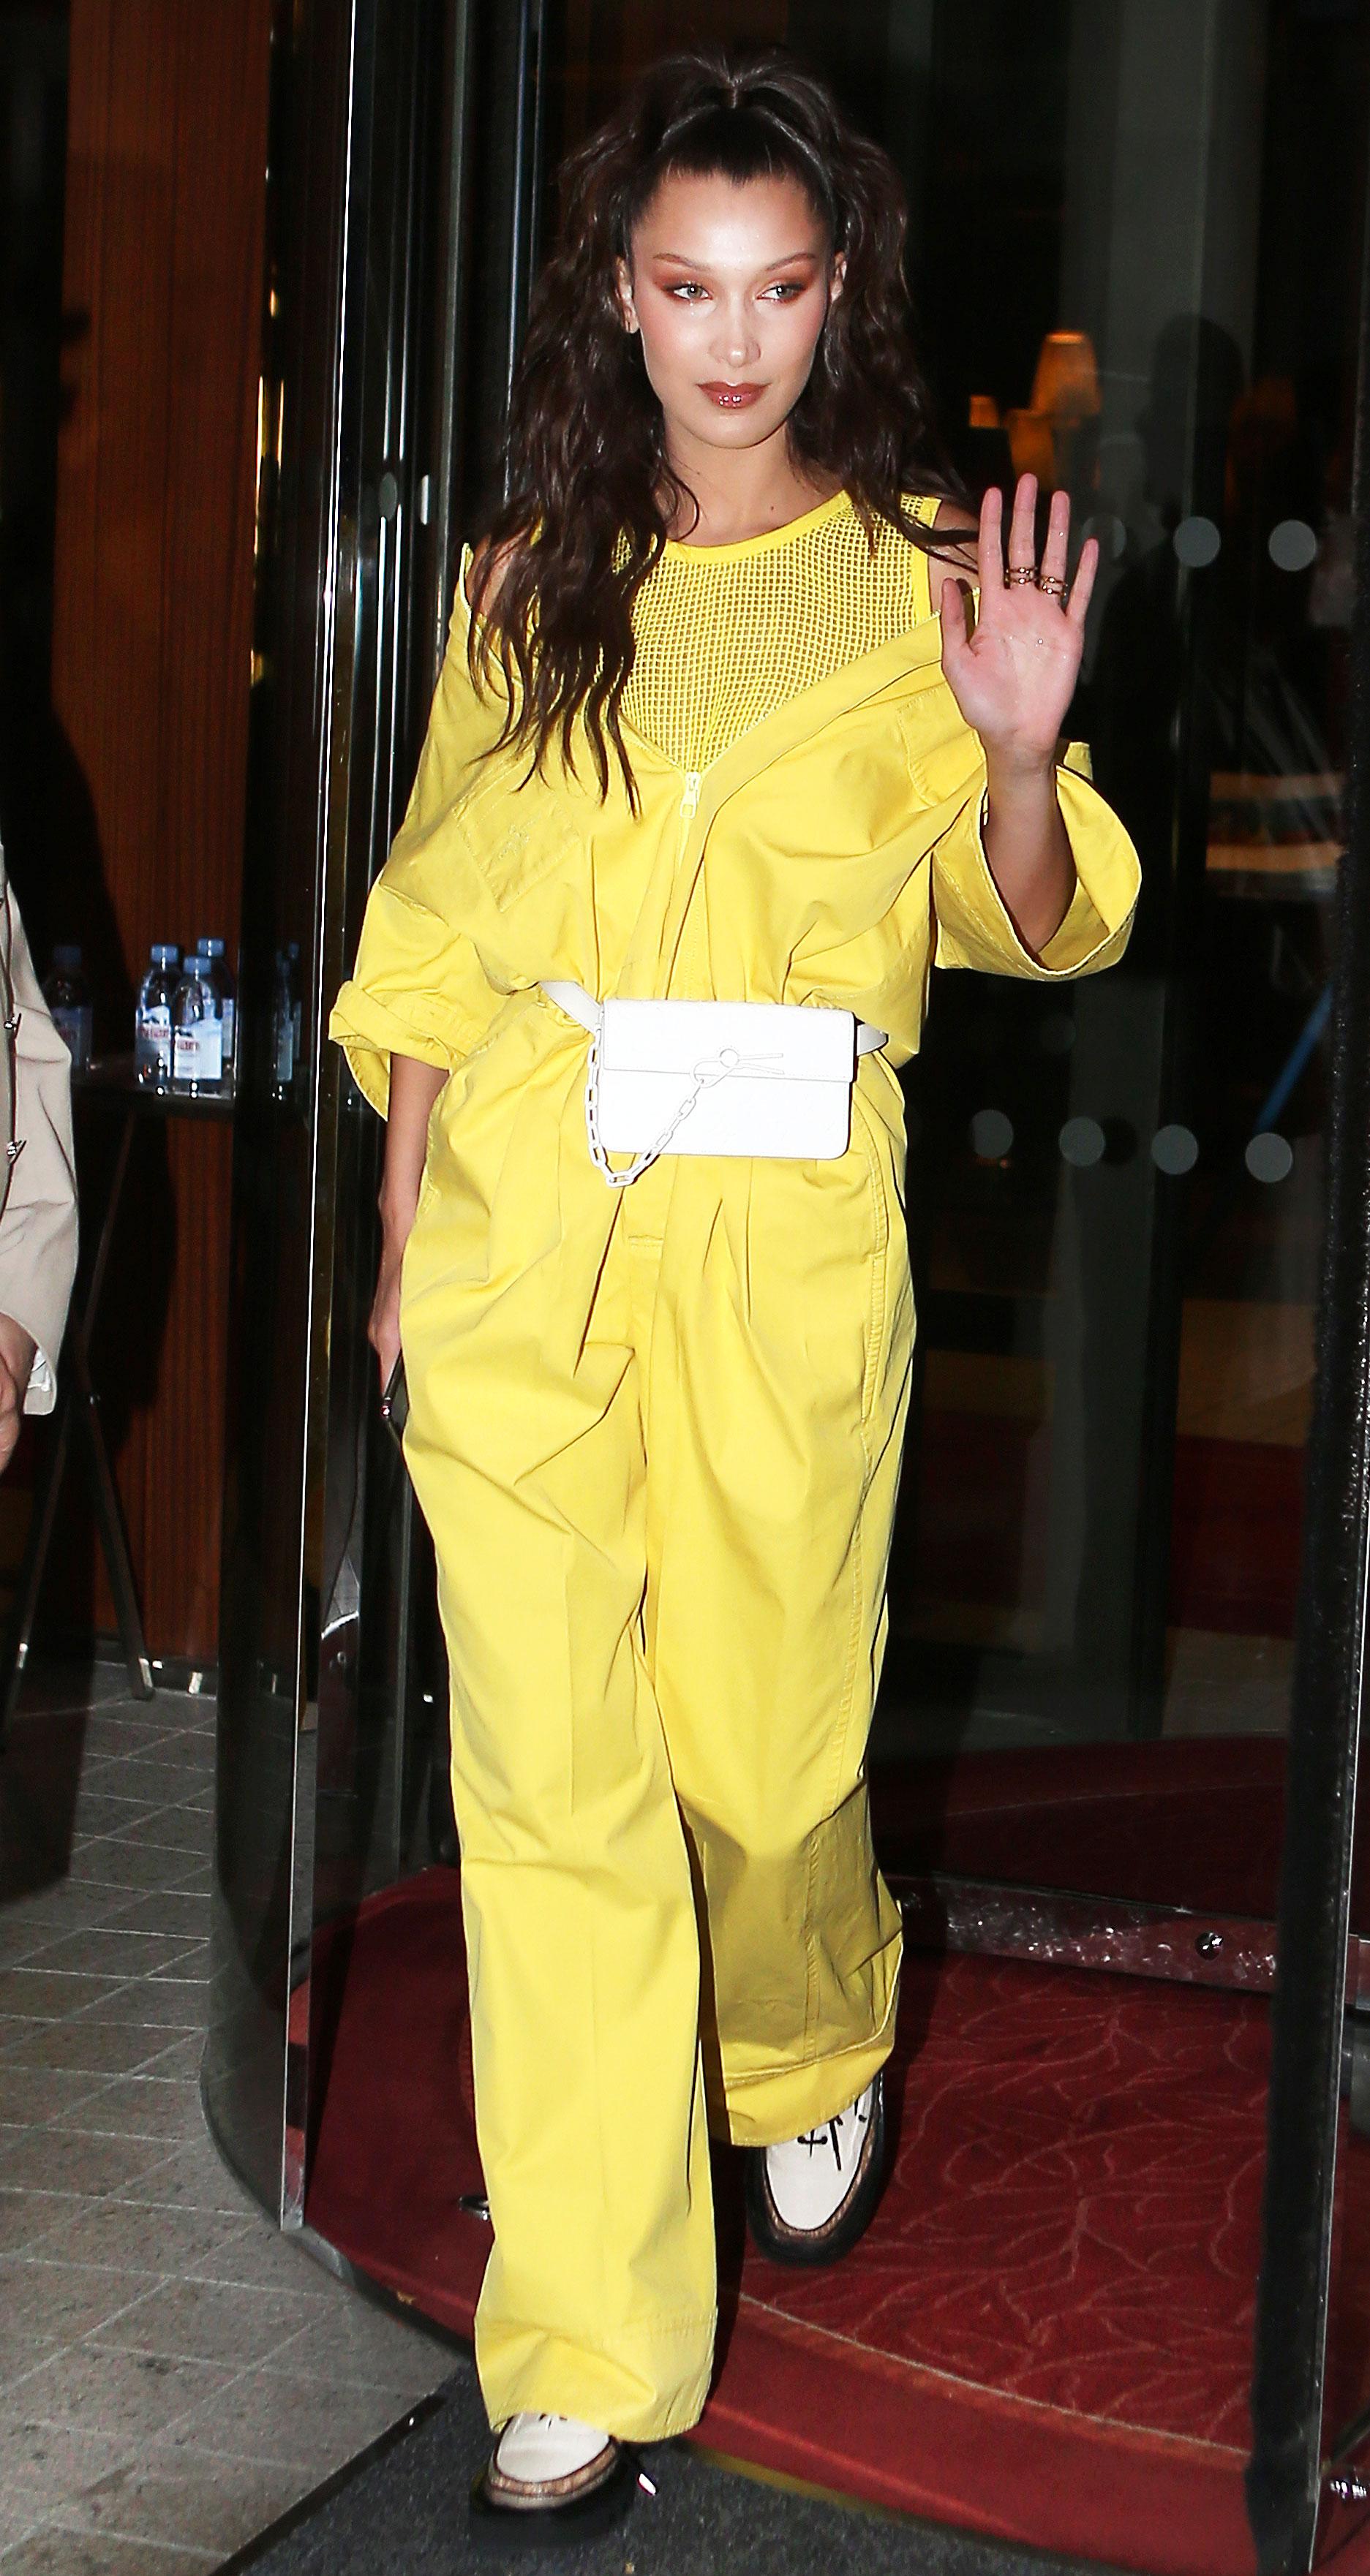 foto Gigi hadid in an all yellow ensemble nyc